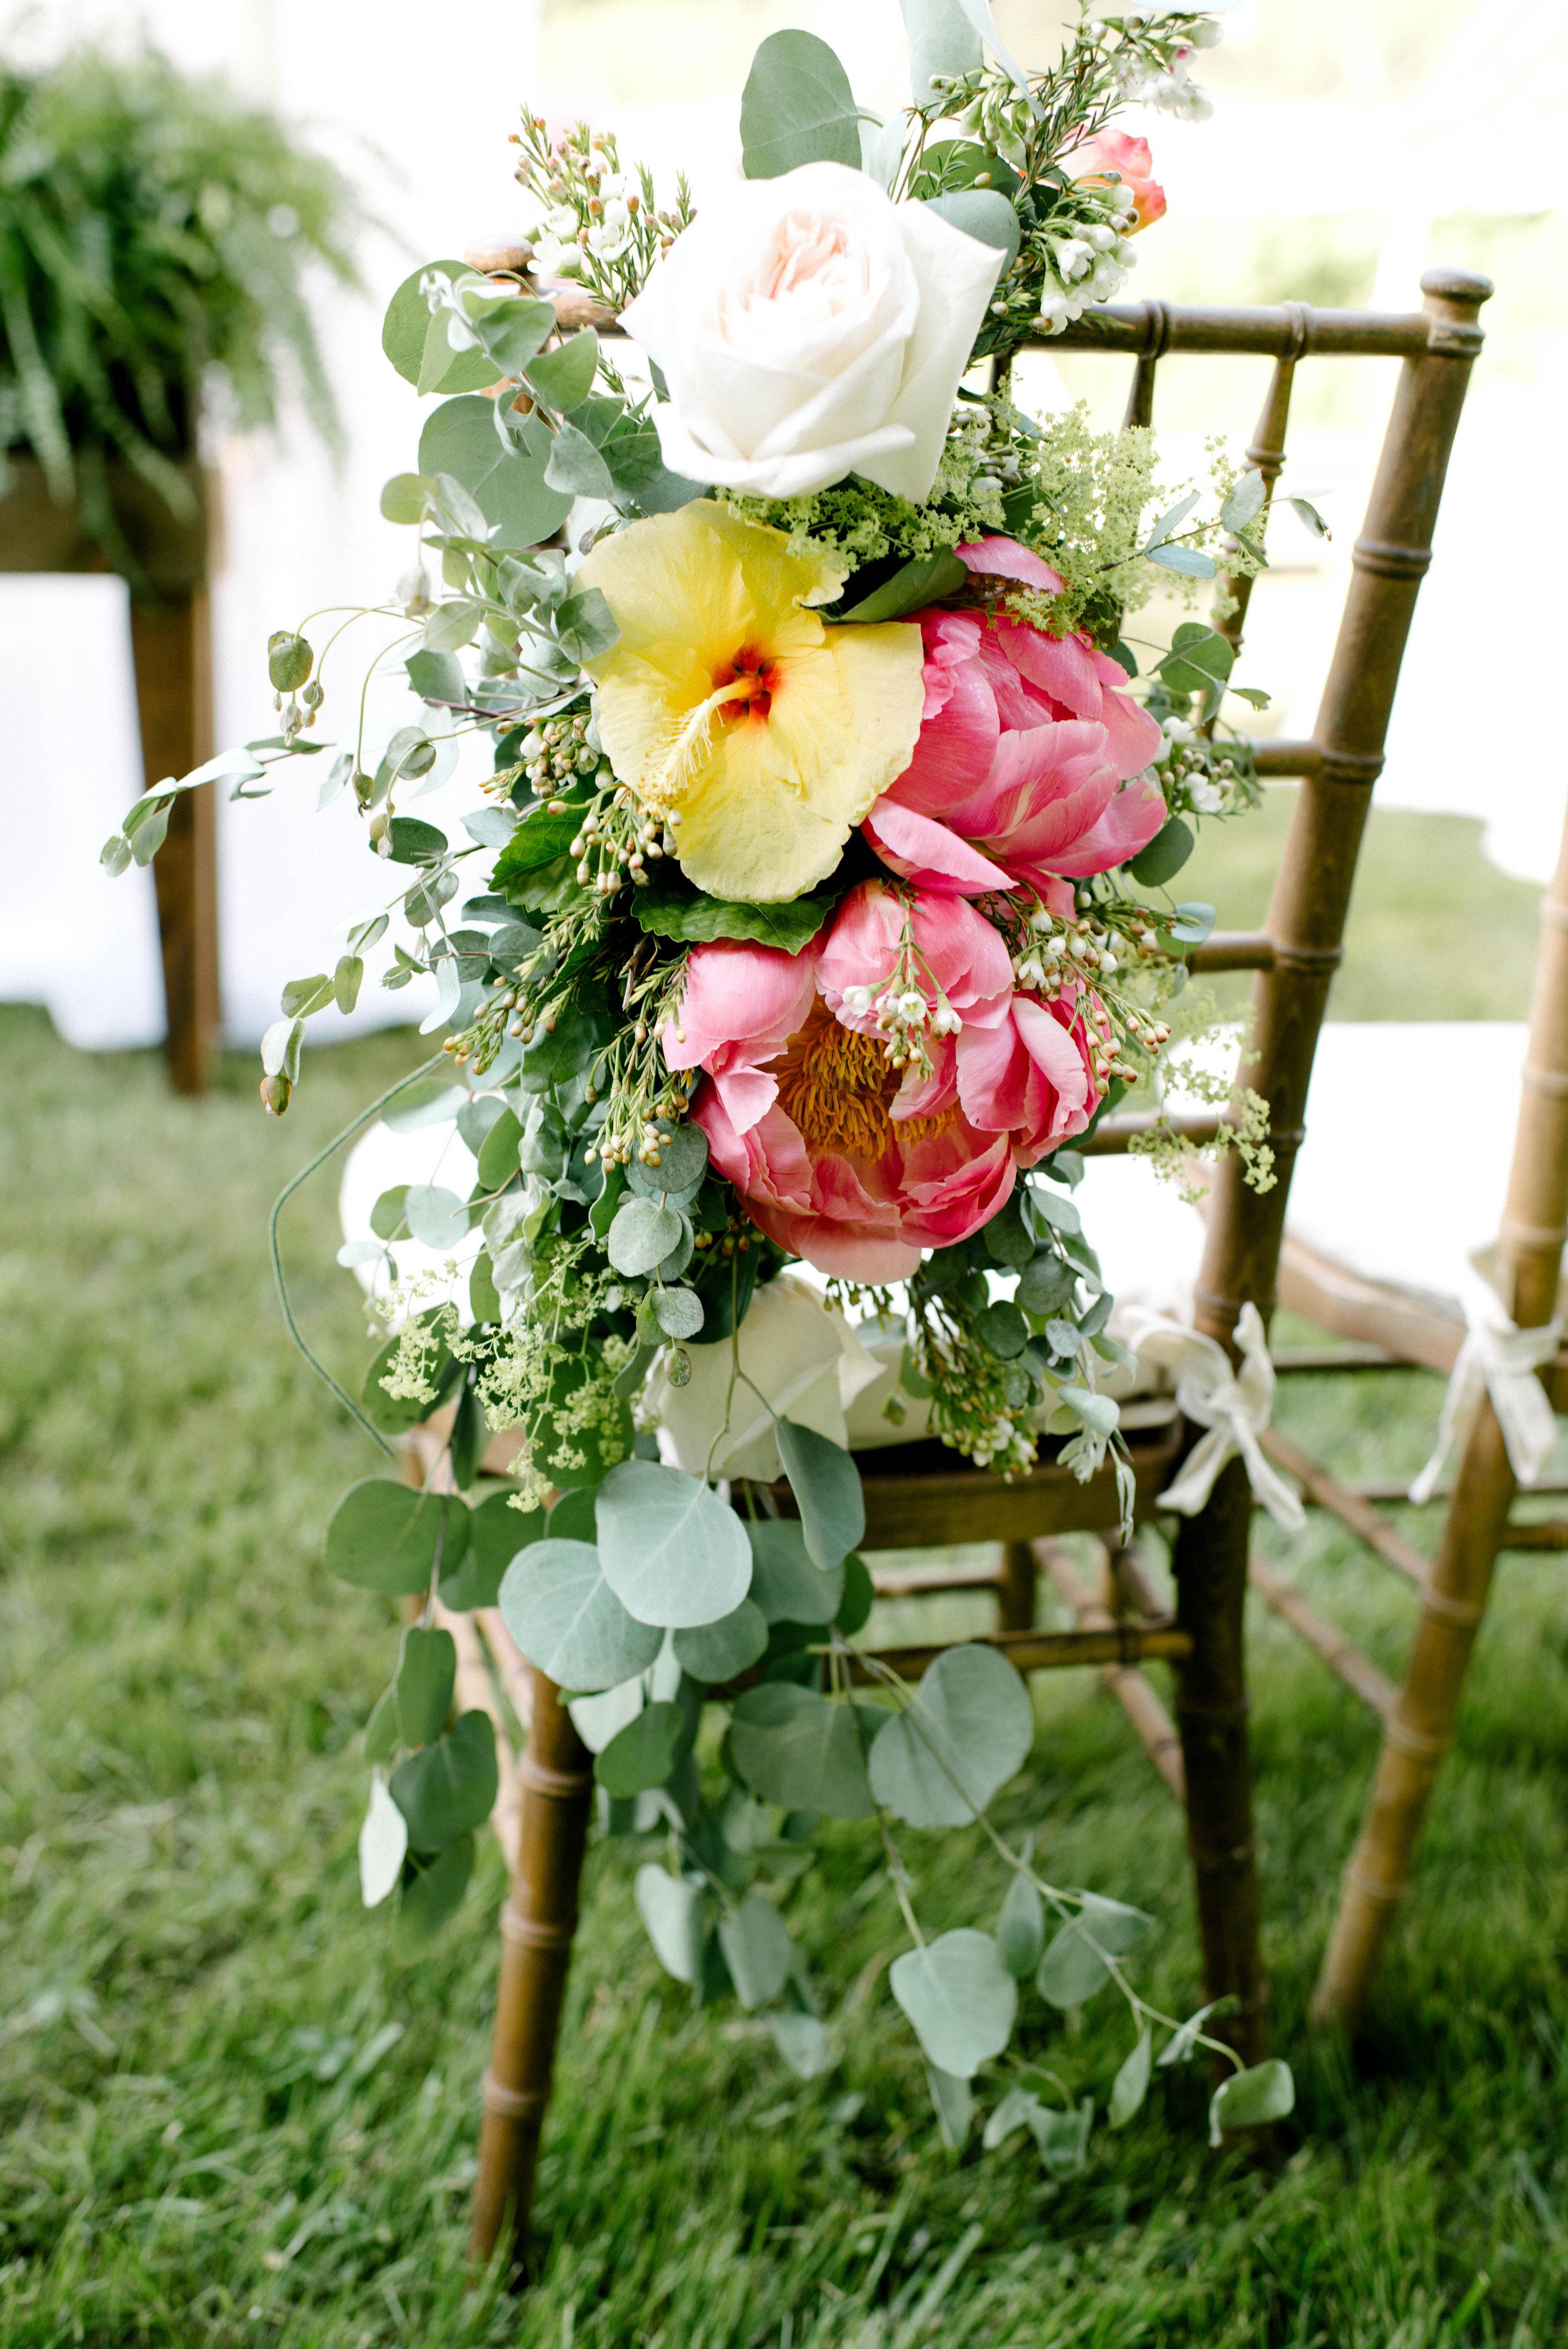 grace jeffrey connecticut wedding wedding flowers decor klw design. Black Bedroom Furniture Sets. Home Design Ideas